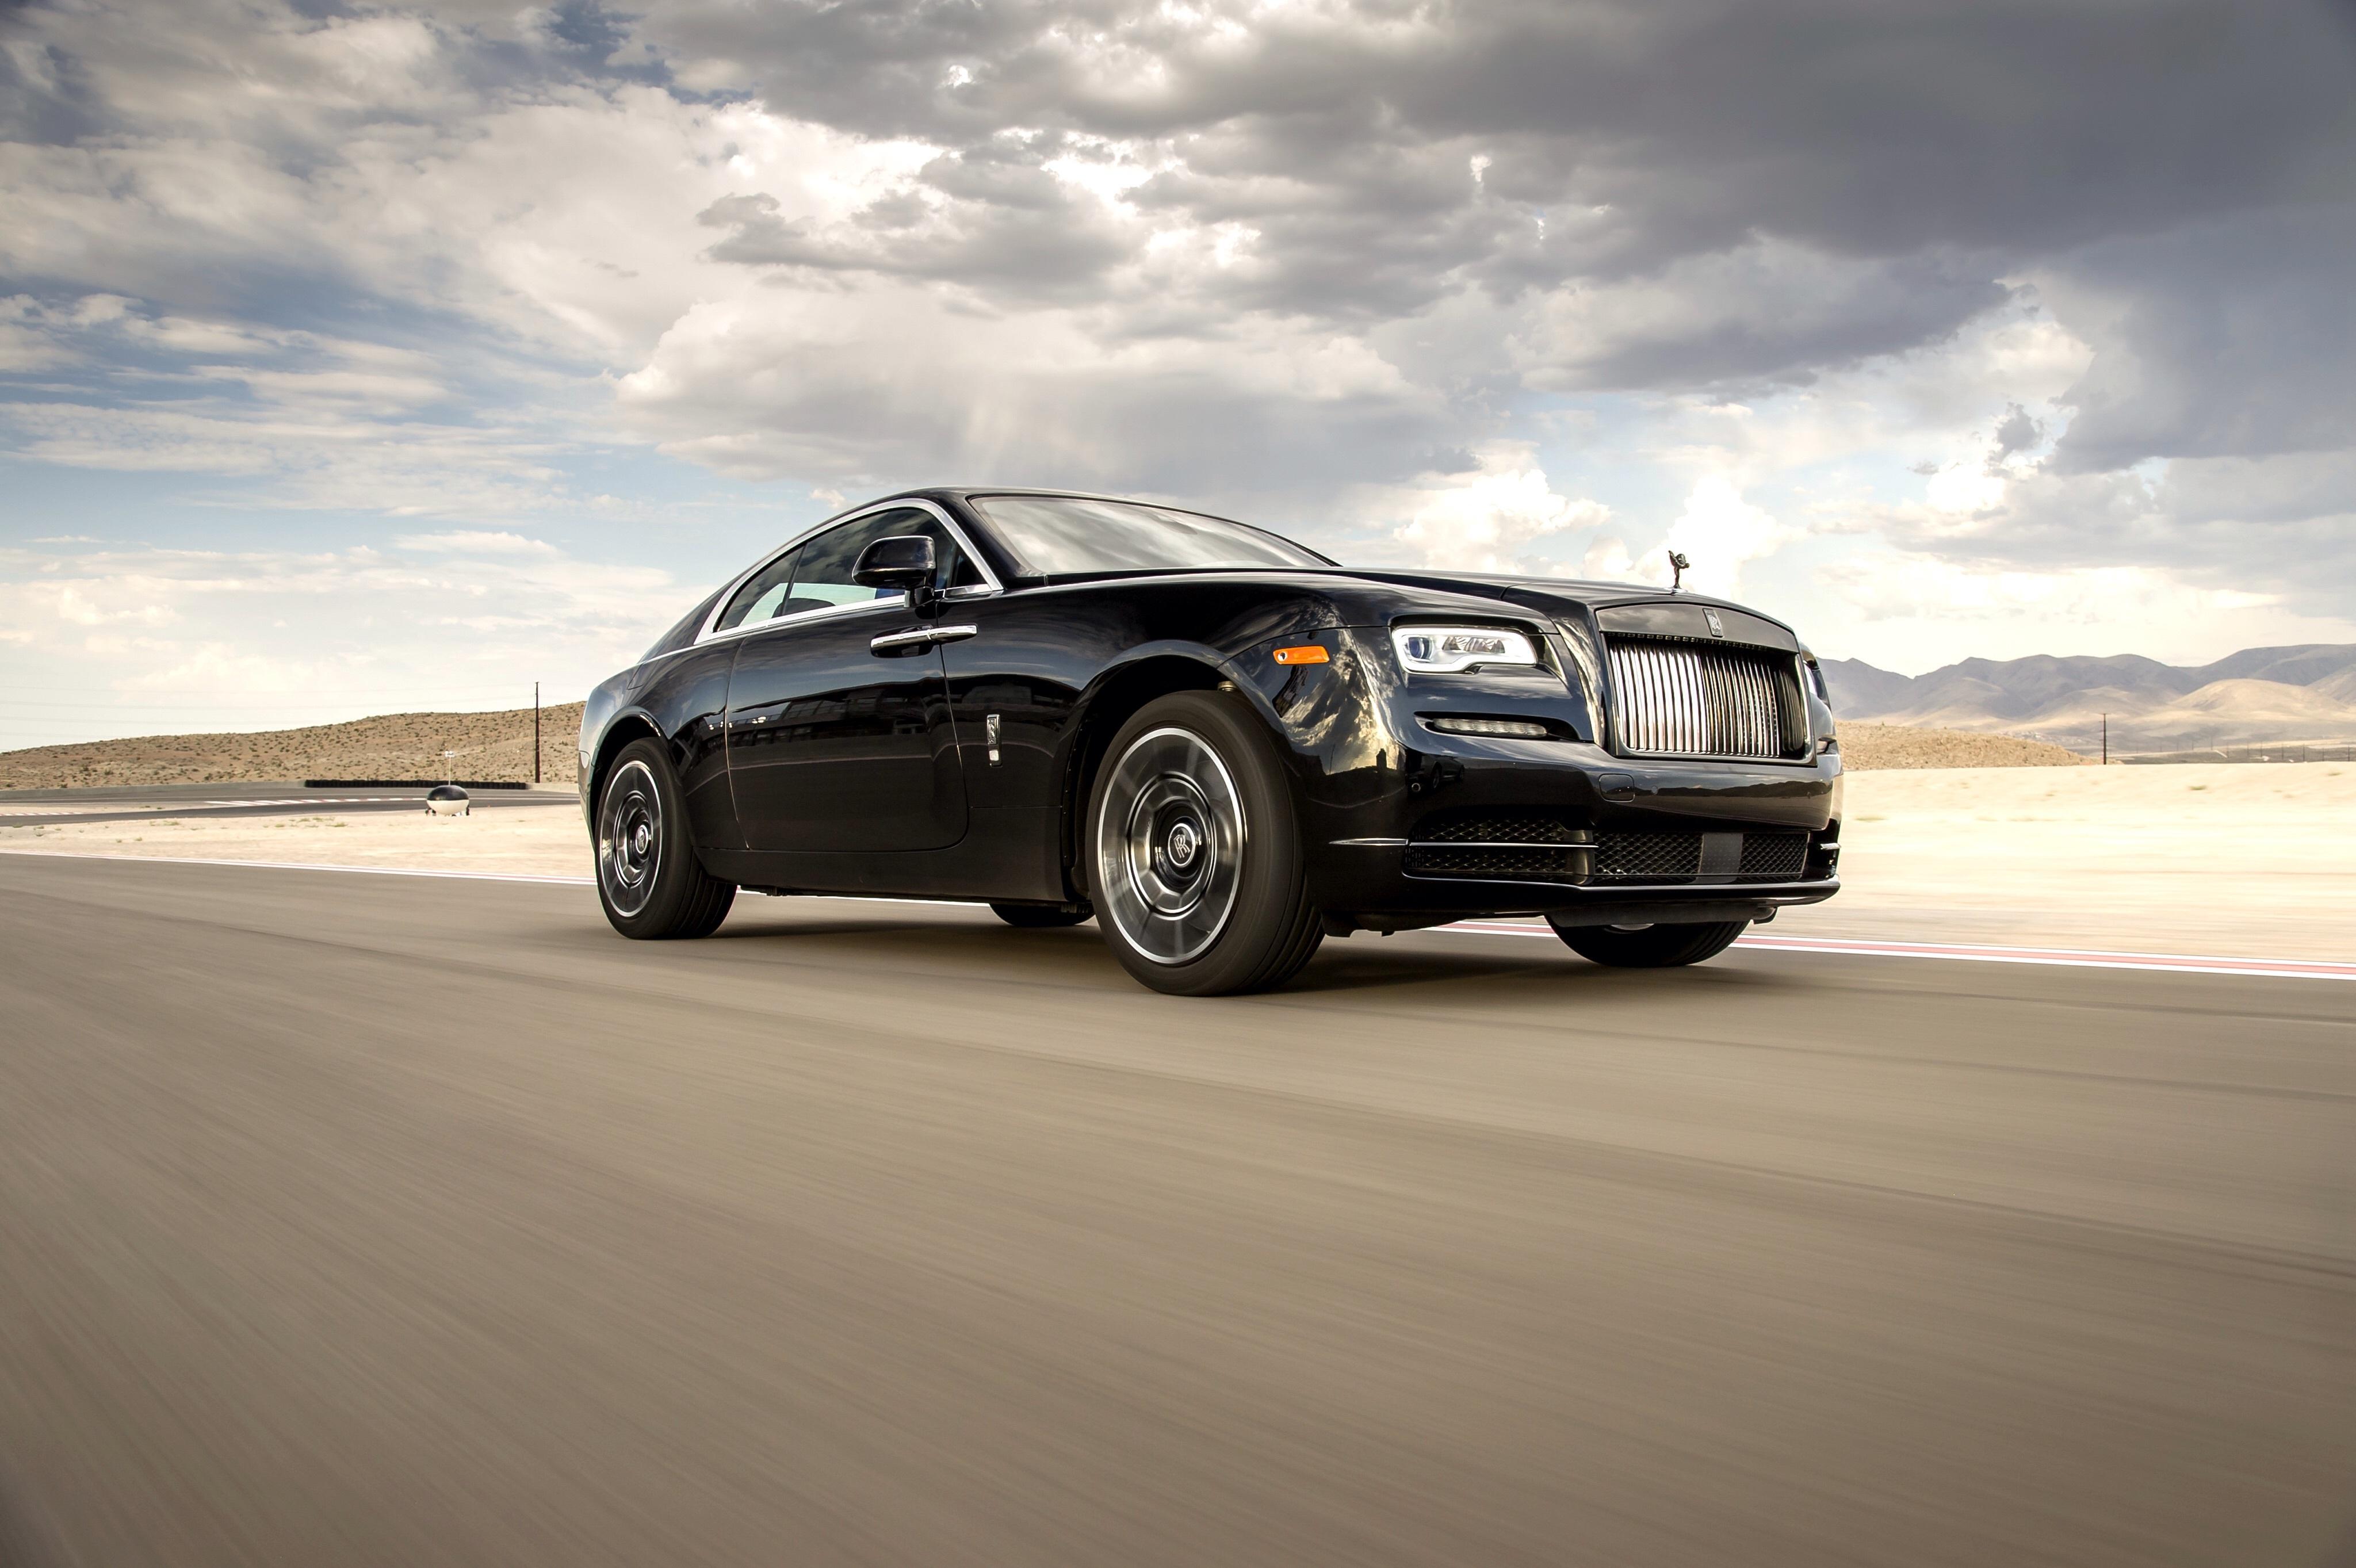 wallpaper side view sports car rolls royce performance car sedan rolls royce wraith. Black Bedroom Furniture Sets. Home Design Ideas